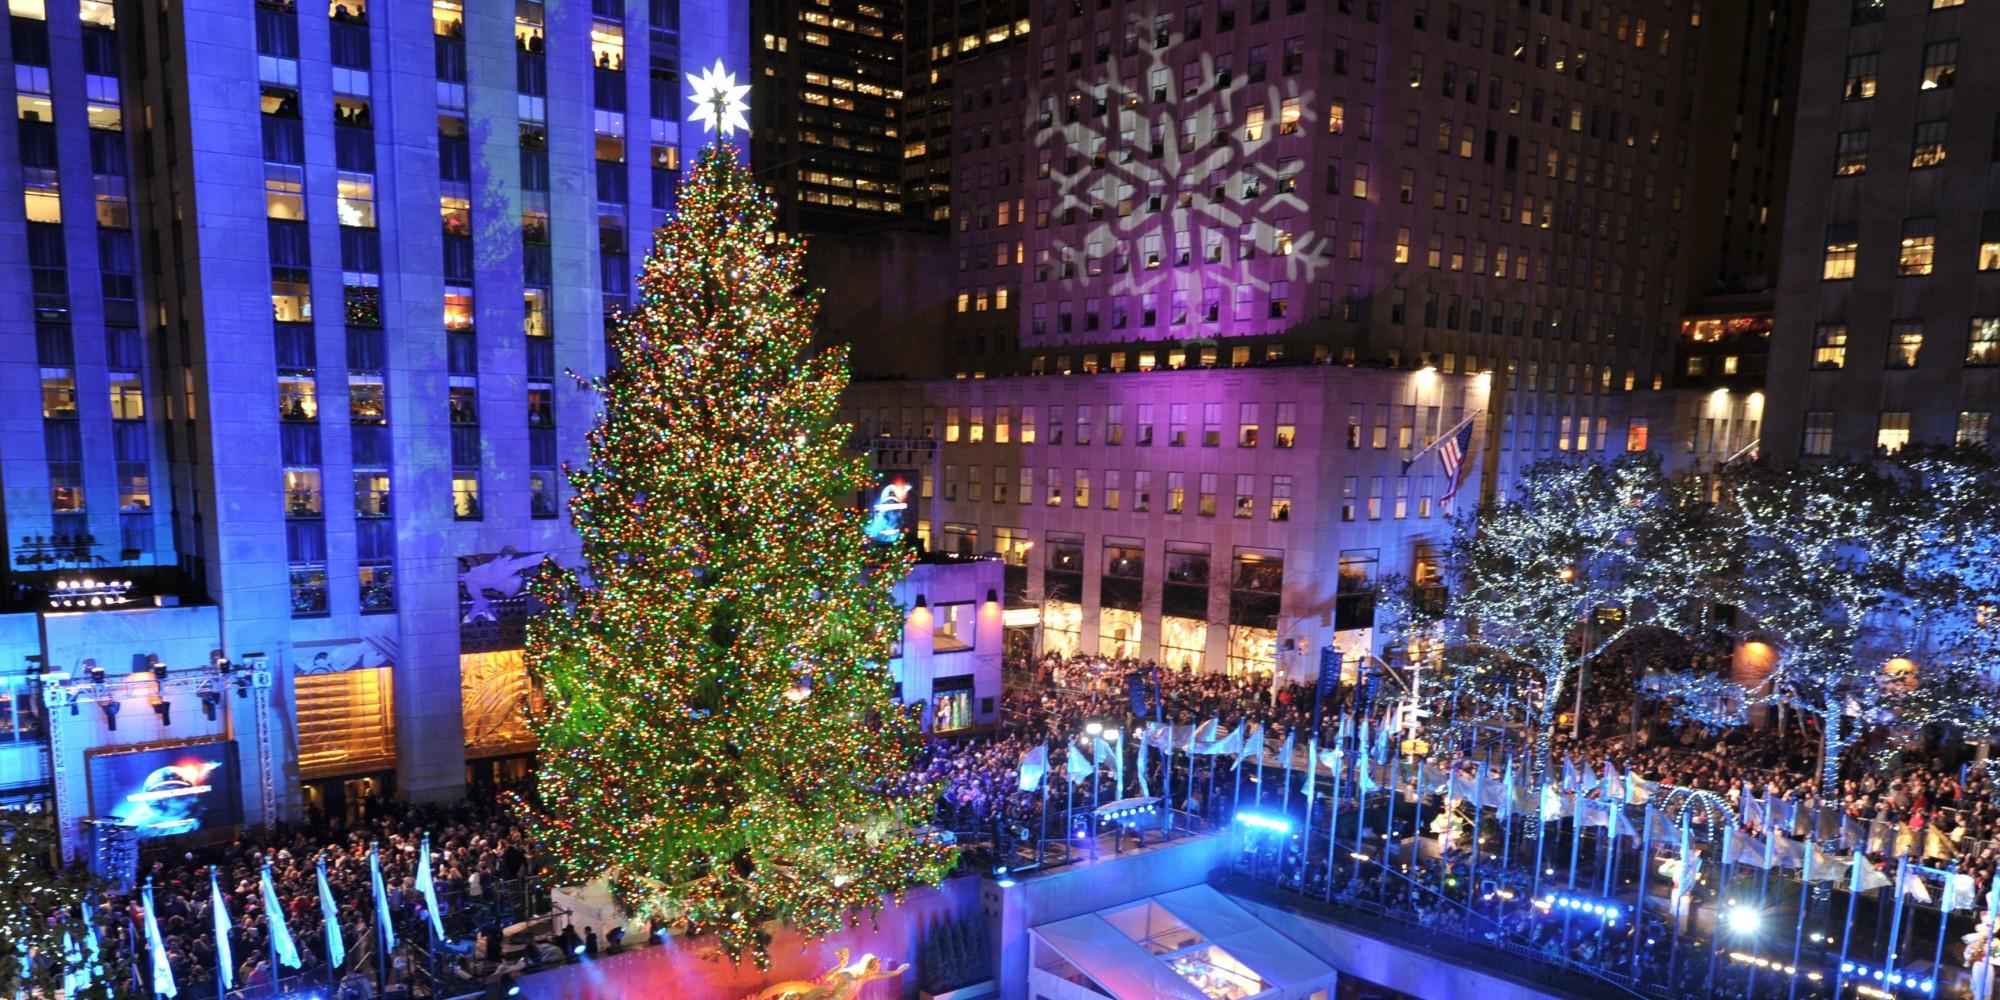 Rockefeller Christmas tree lighting 2018 - New York Magazine Events